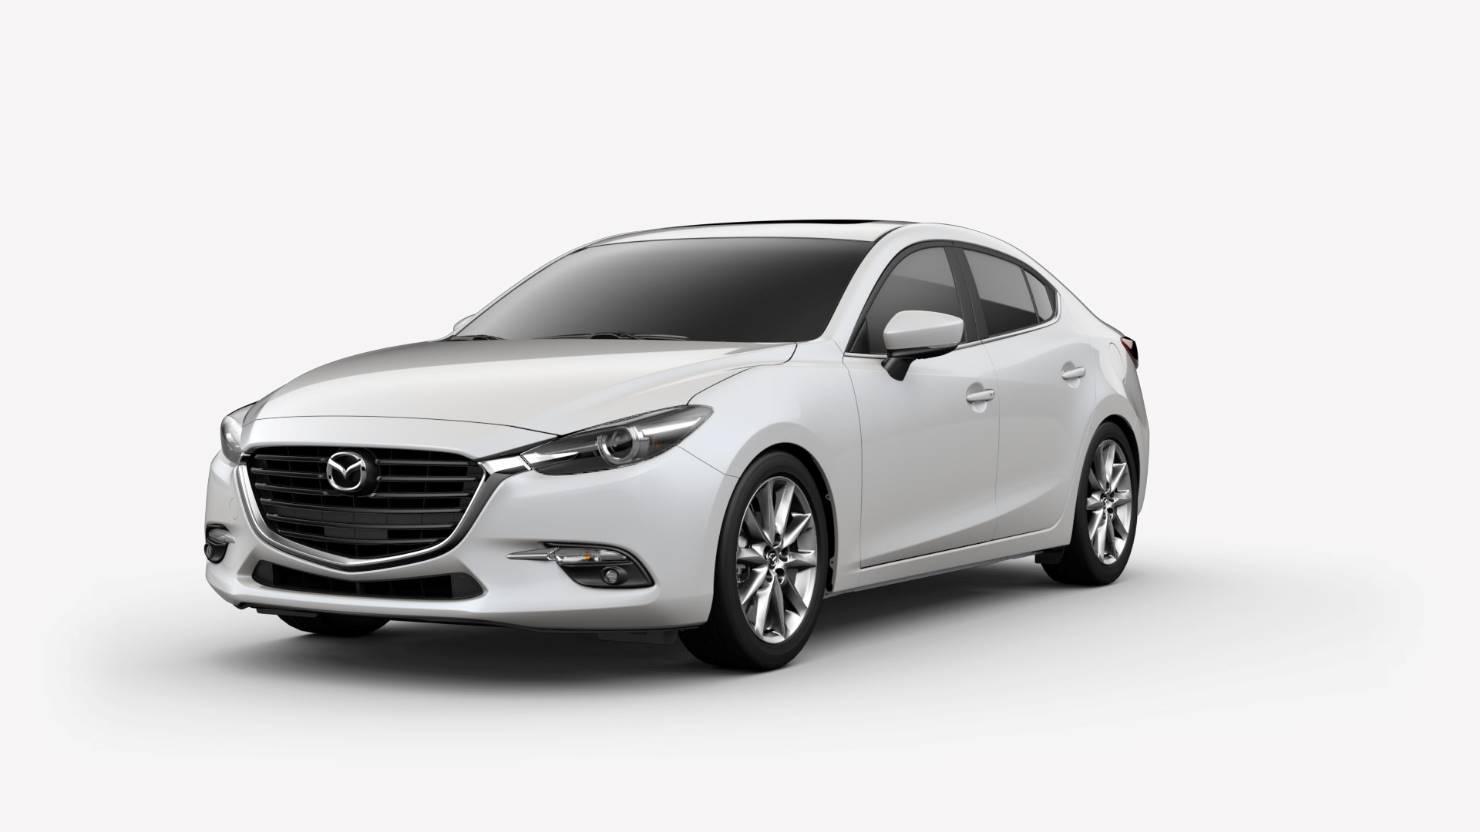 2018 Mazda3 Sedan, Snowflake White Pearl